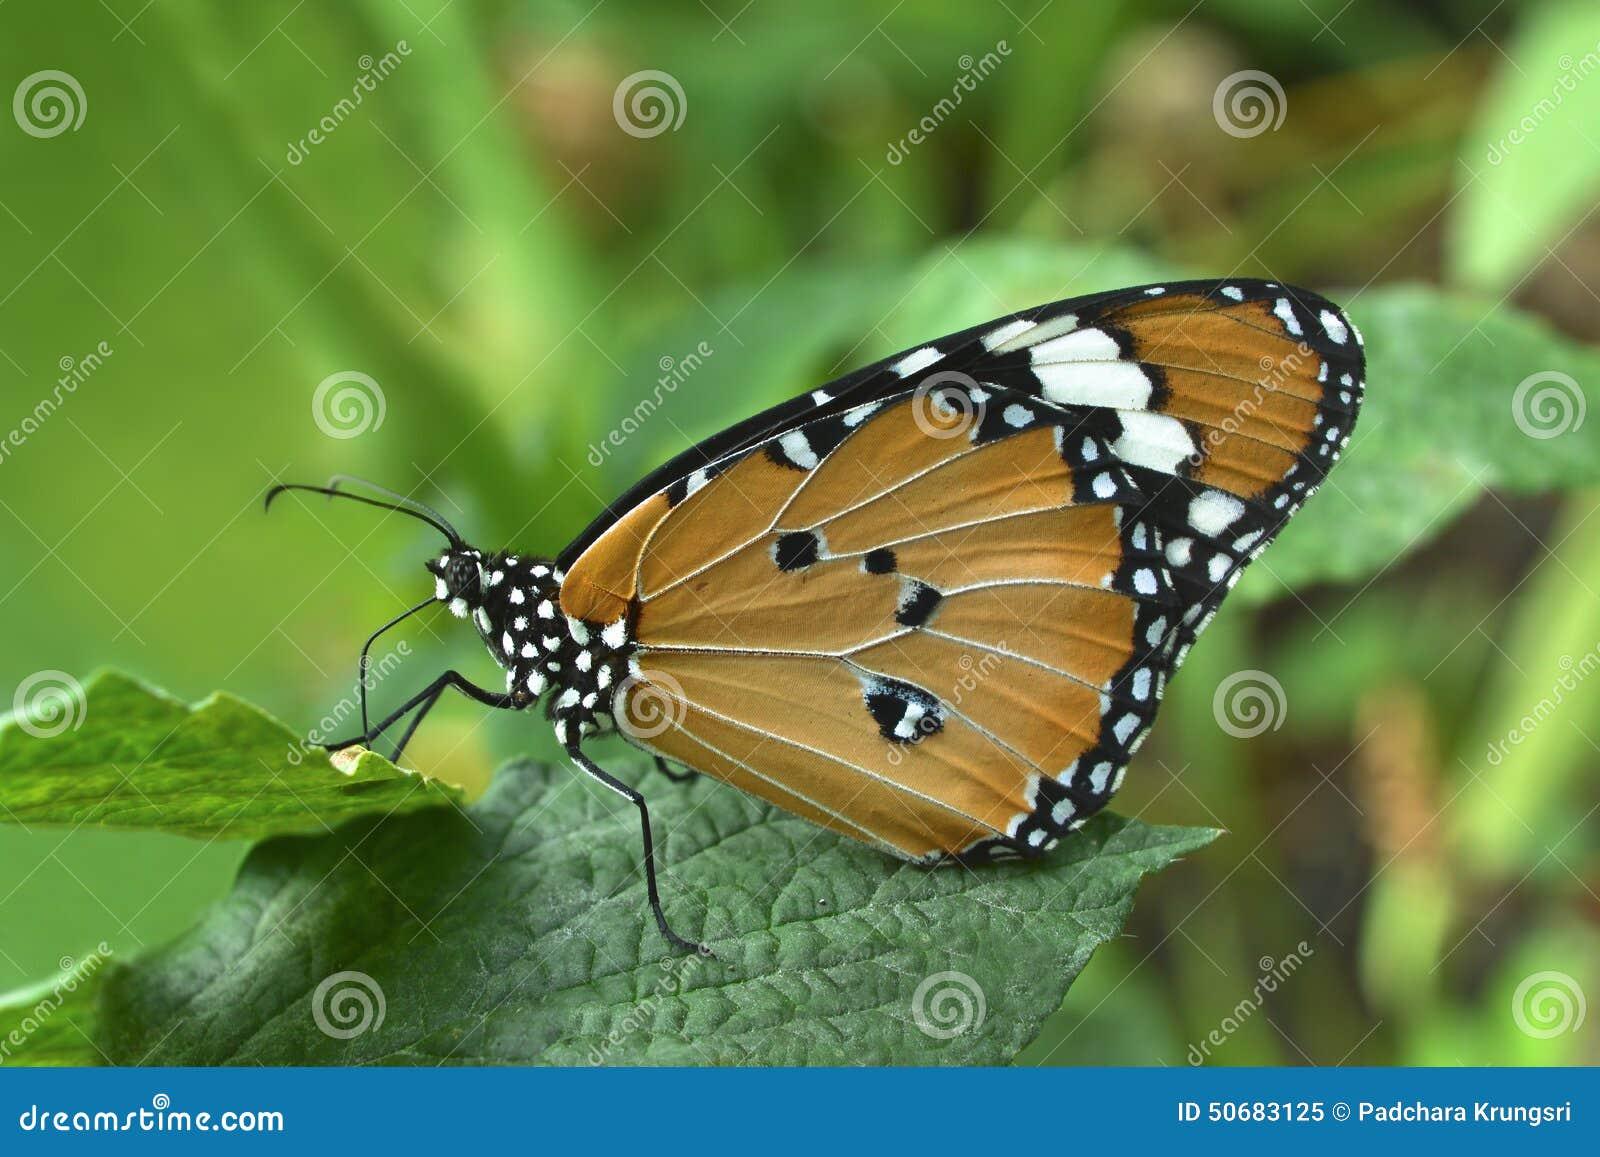 Download 蝴蝶 库存图片. 图片 包括有 模式, 绿色, 唯一, 的百威, 敌意, 蝴蝶, 中风, 五颜六色, 公园 - 50683125